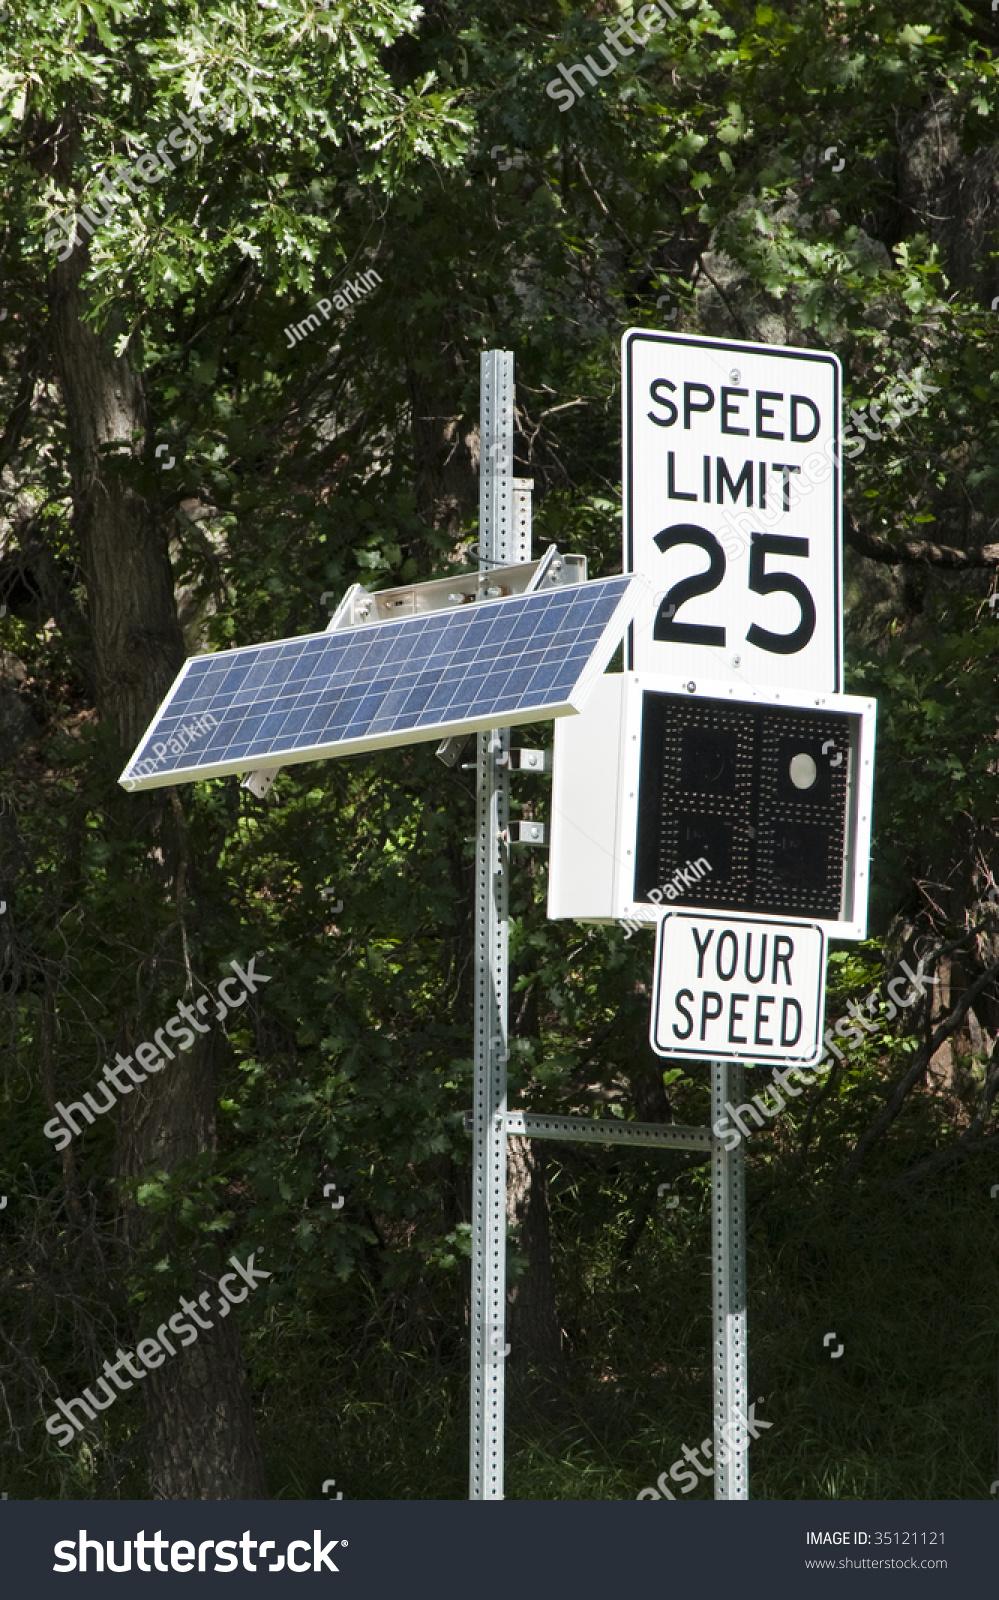 Solar Powered Radar Measured Speed Indicator Sign Stock